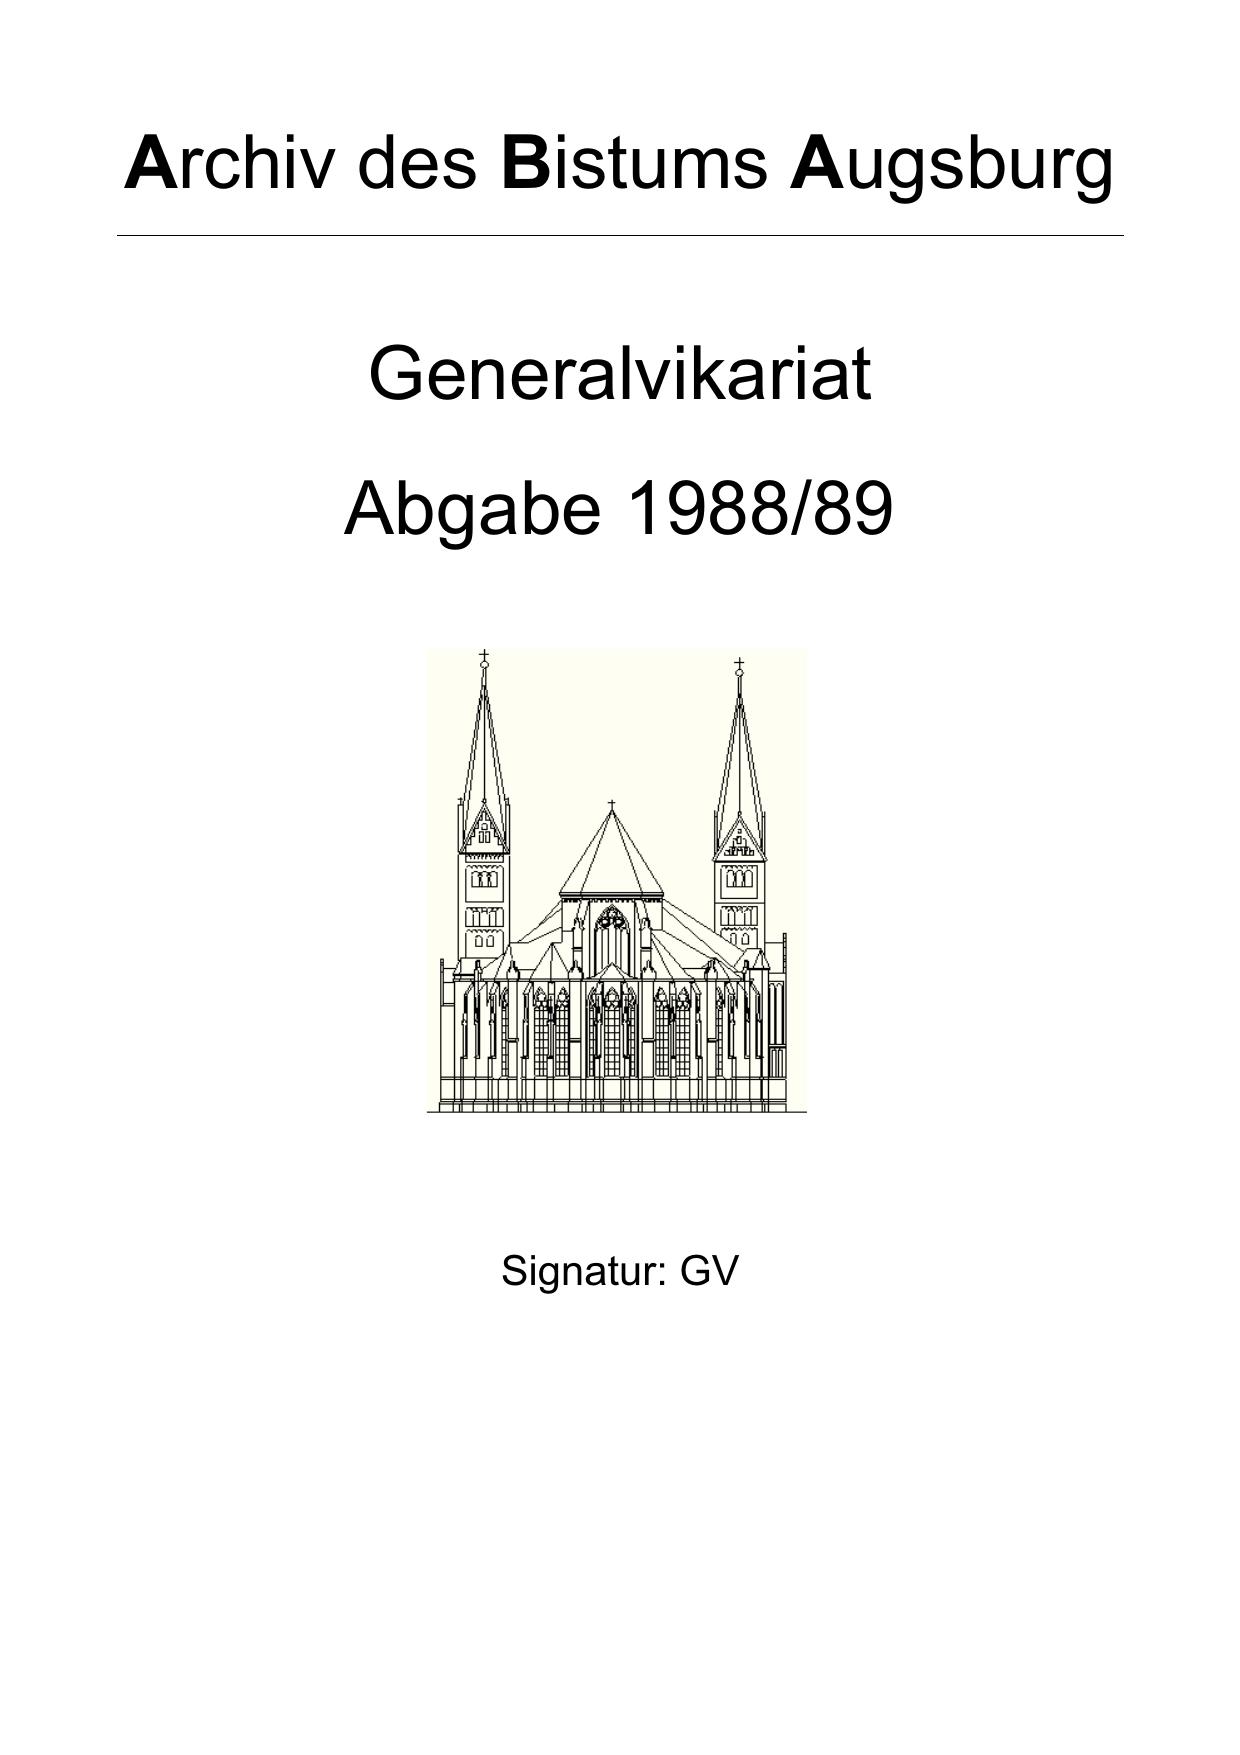 Abgabe 1988/89 - Bistum Augsburg | manualzz.com